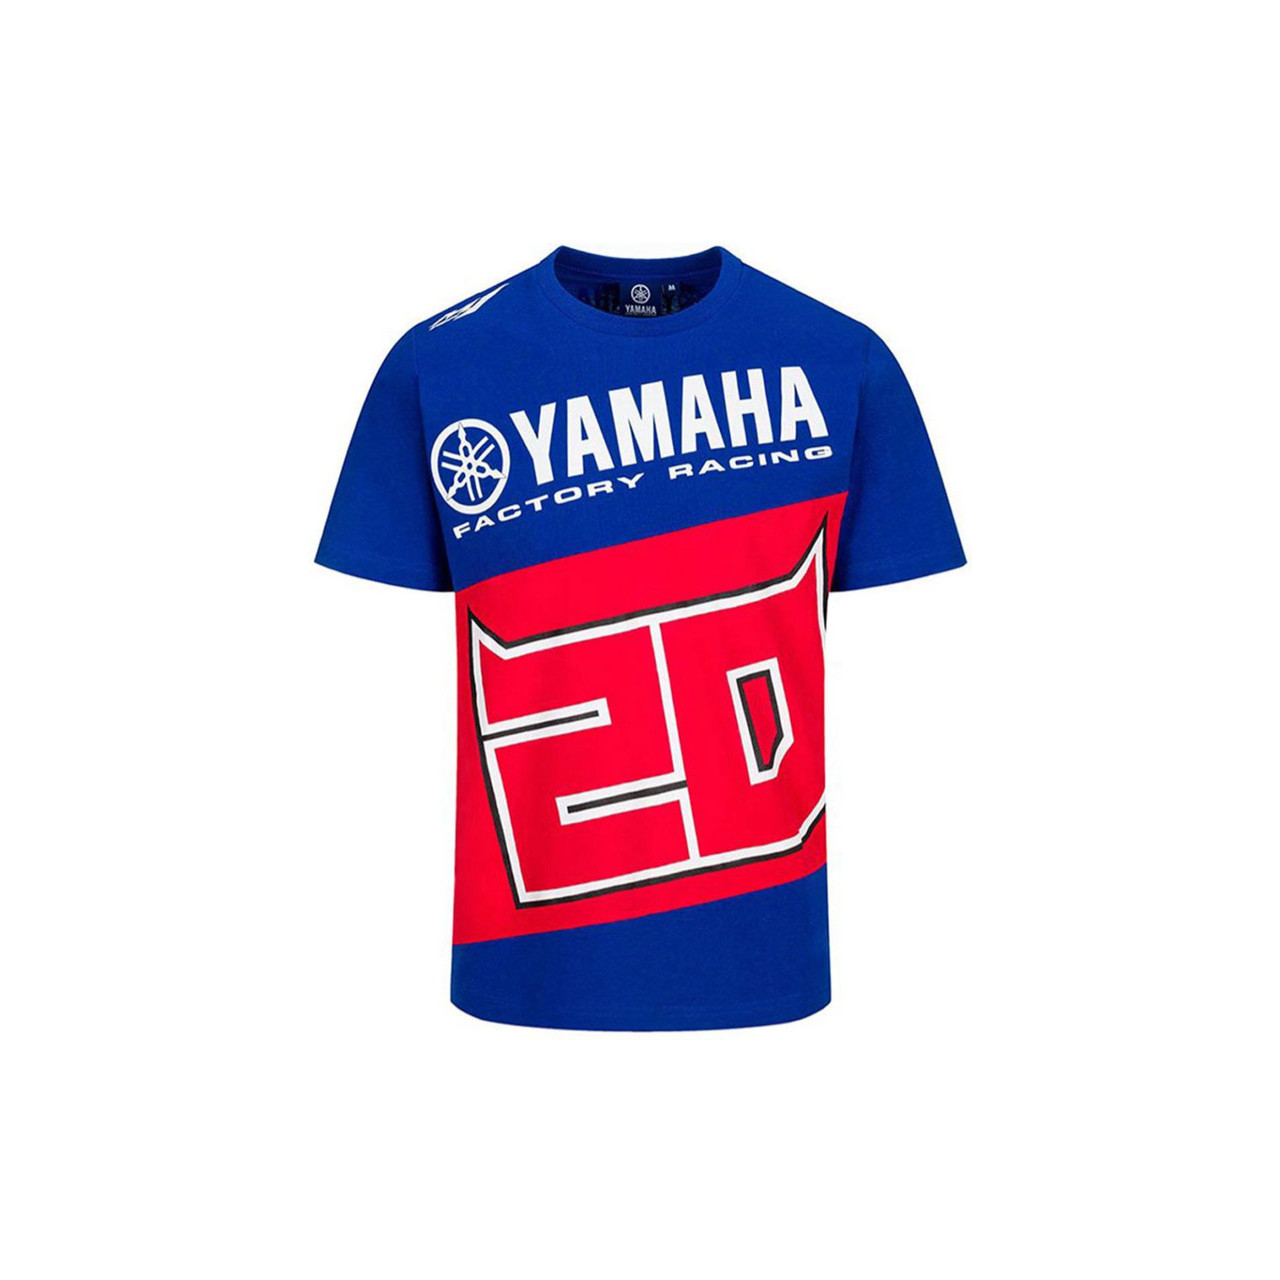 YAMAHA T-shirt homme Fabio Quartararo 2021 bleu et rouge